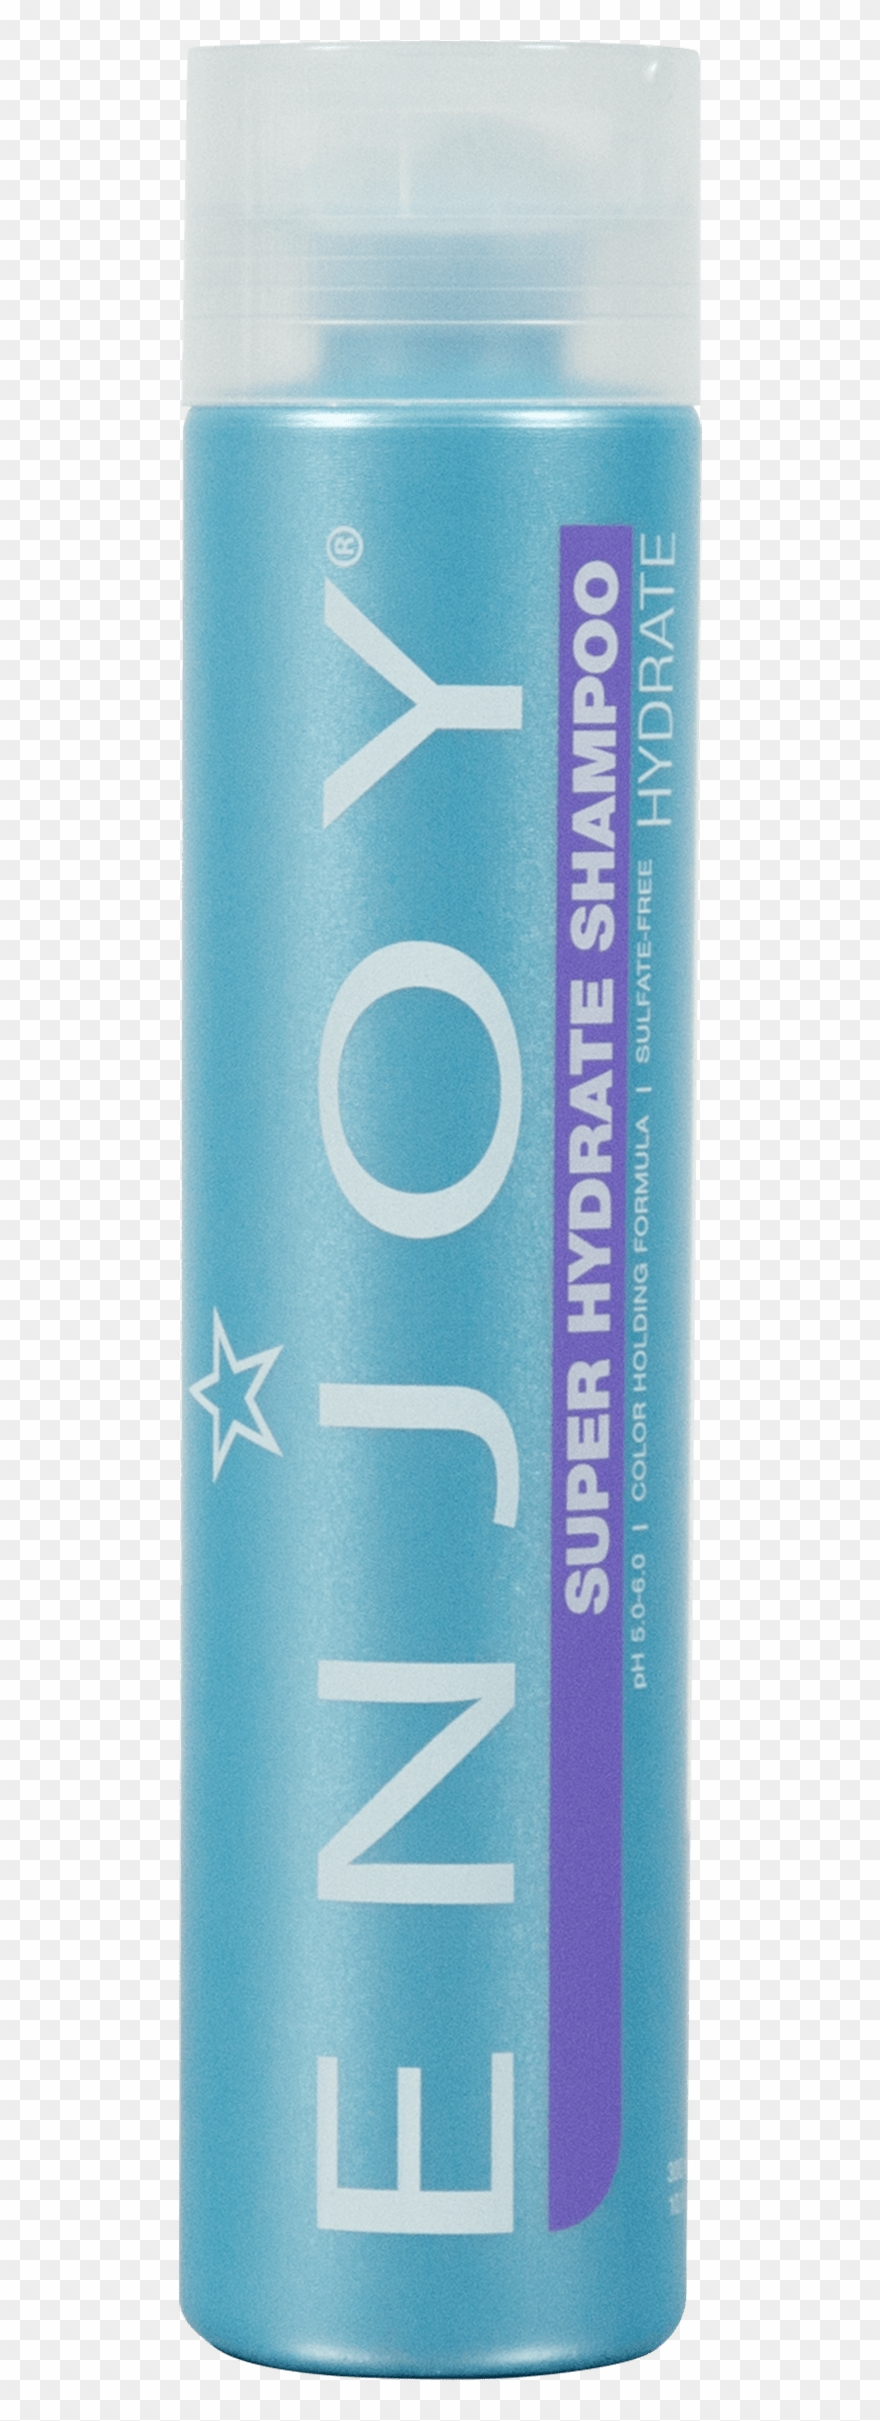 Super Hydrate Shampoo - Hair Conditioner Clipart